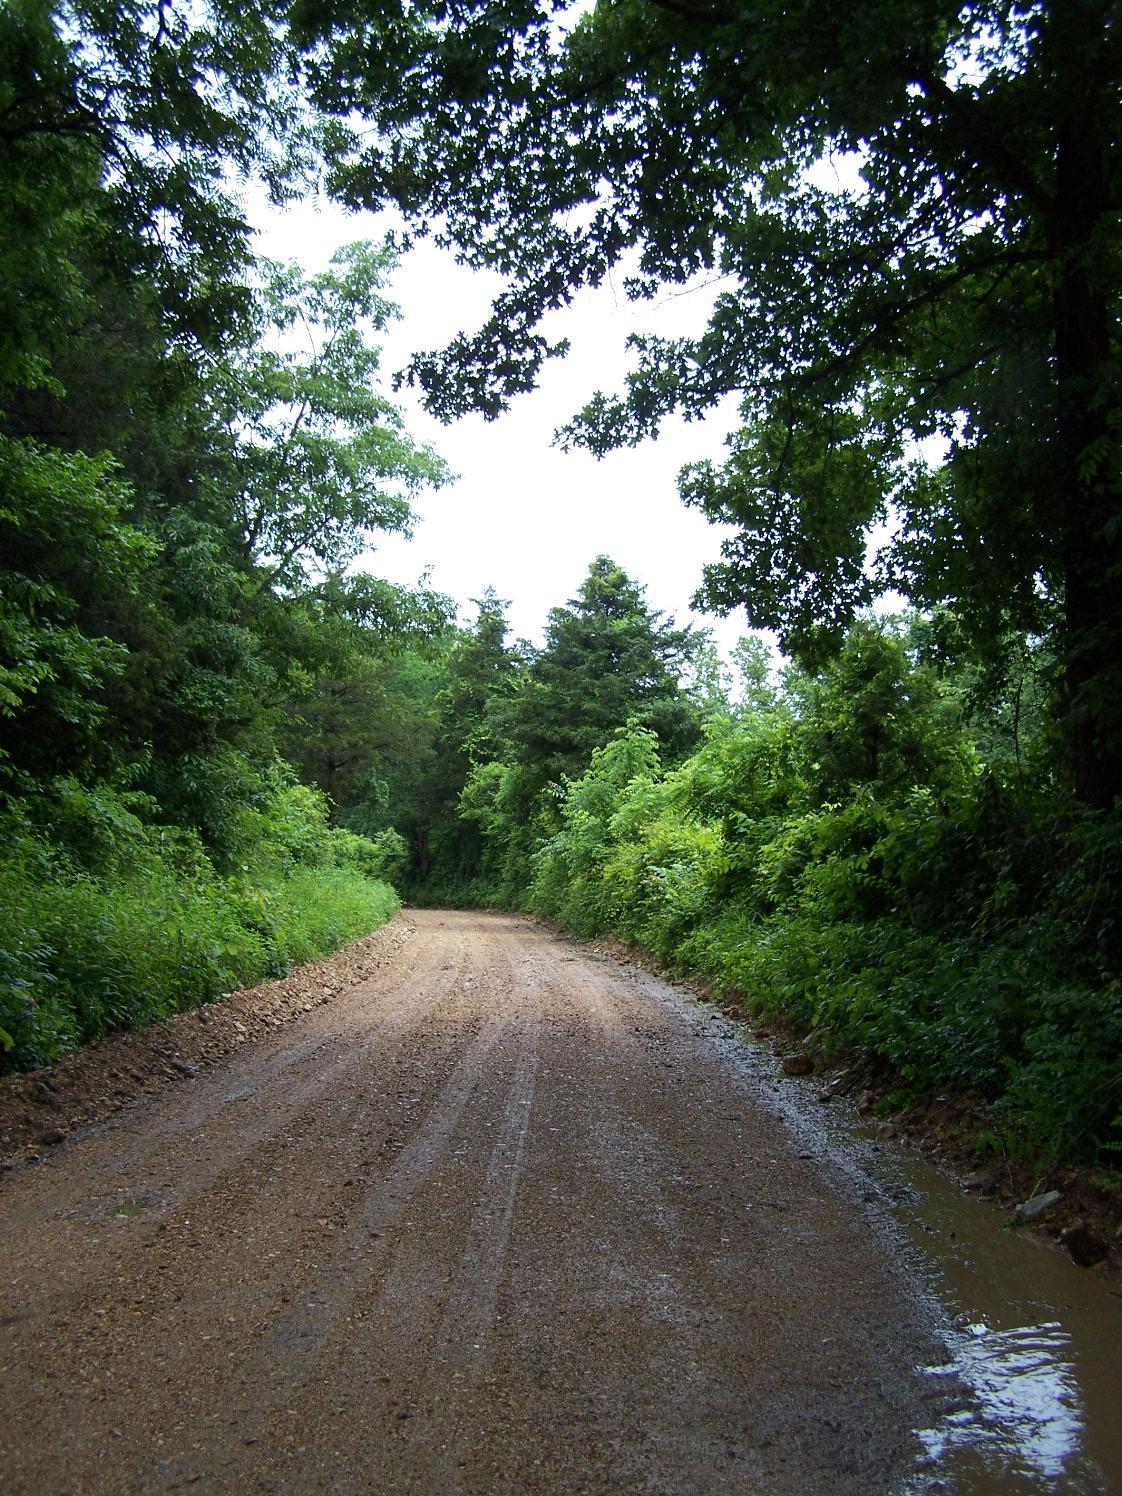 Tbd County Road 228